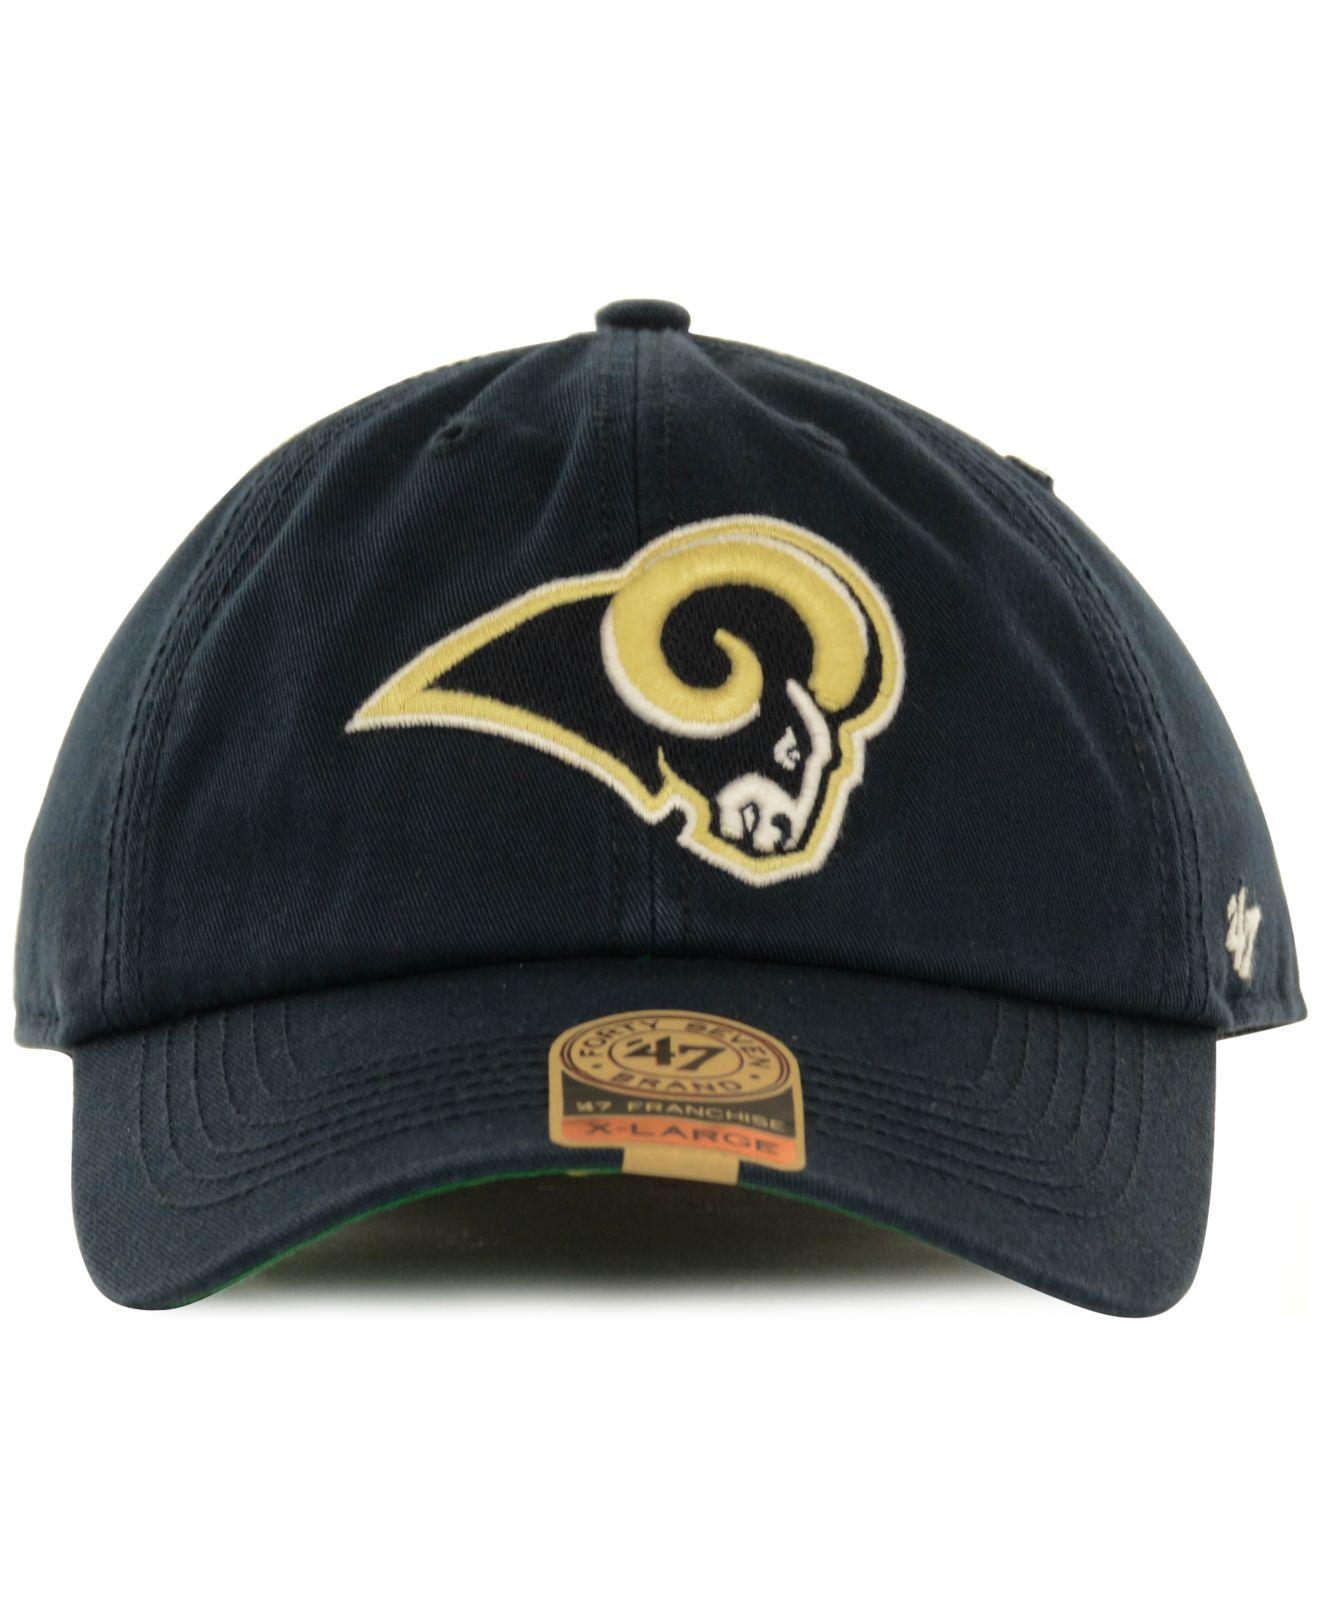 408822d63da Lyst - 47 Brand St. Louis Rams Franchise Hat in Blue for Men